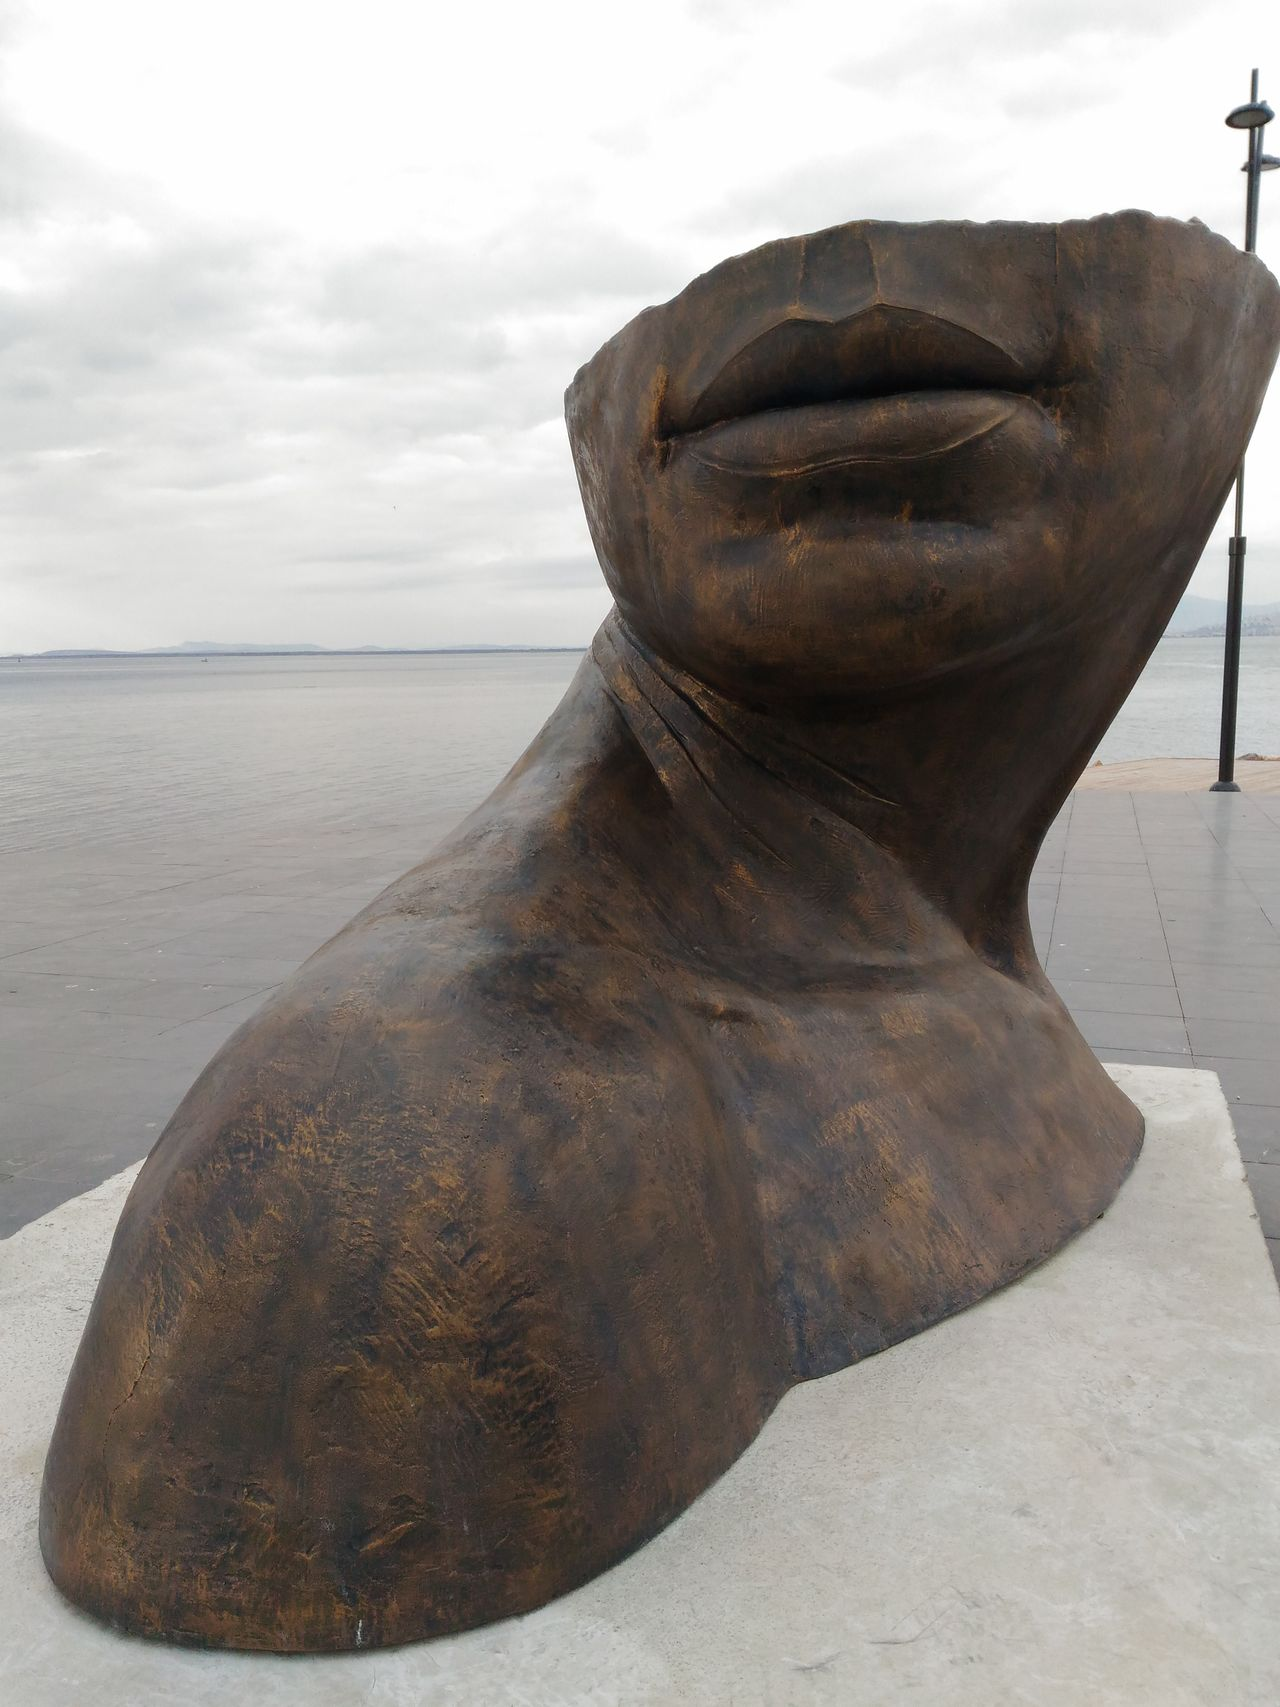 Sea Sky Day Outdoors Human Body Part Best Eyem Photo Statue HEAD Bronze Statue Funny Faces Men Having Fun Good Times Best Shots EyeEm Türkei